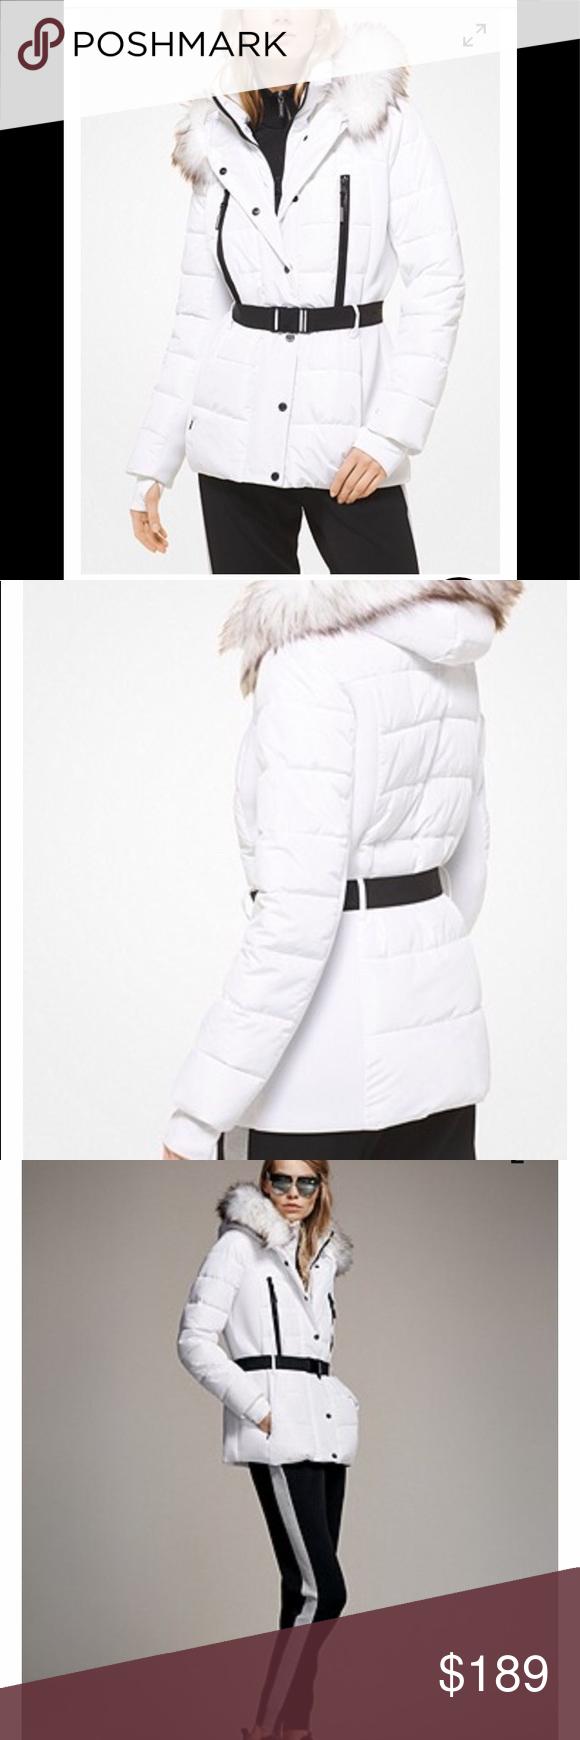 New Michael Kors Puffer Jacket Clothes Design Fashion Michael Kors Jackets [ 1740 x 580 Pixel ]